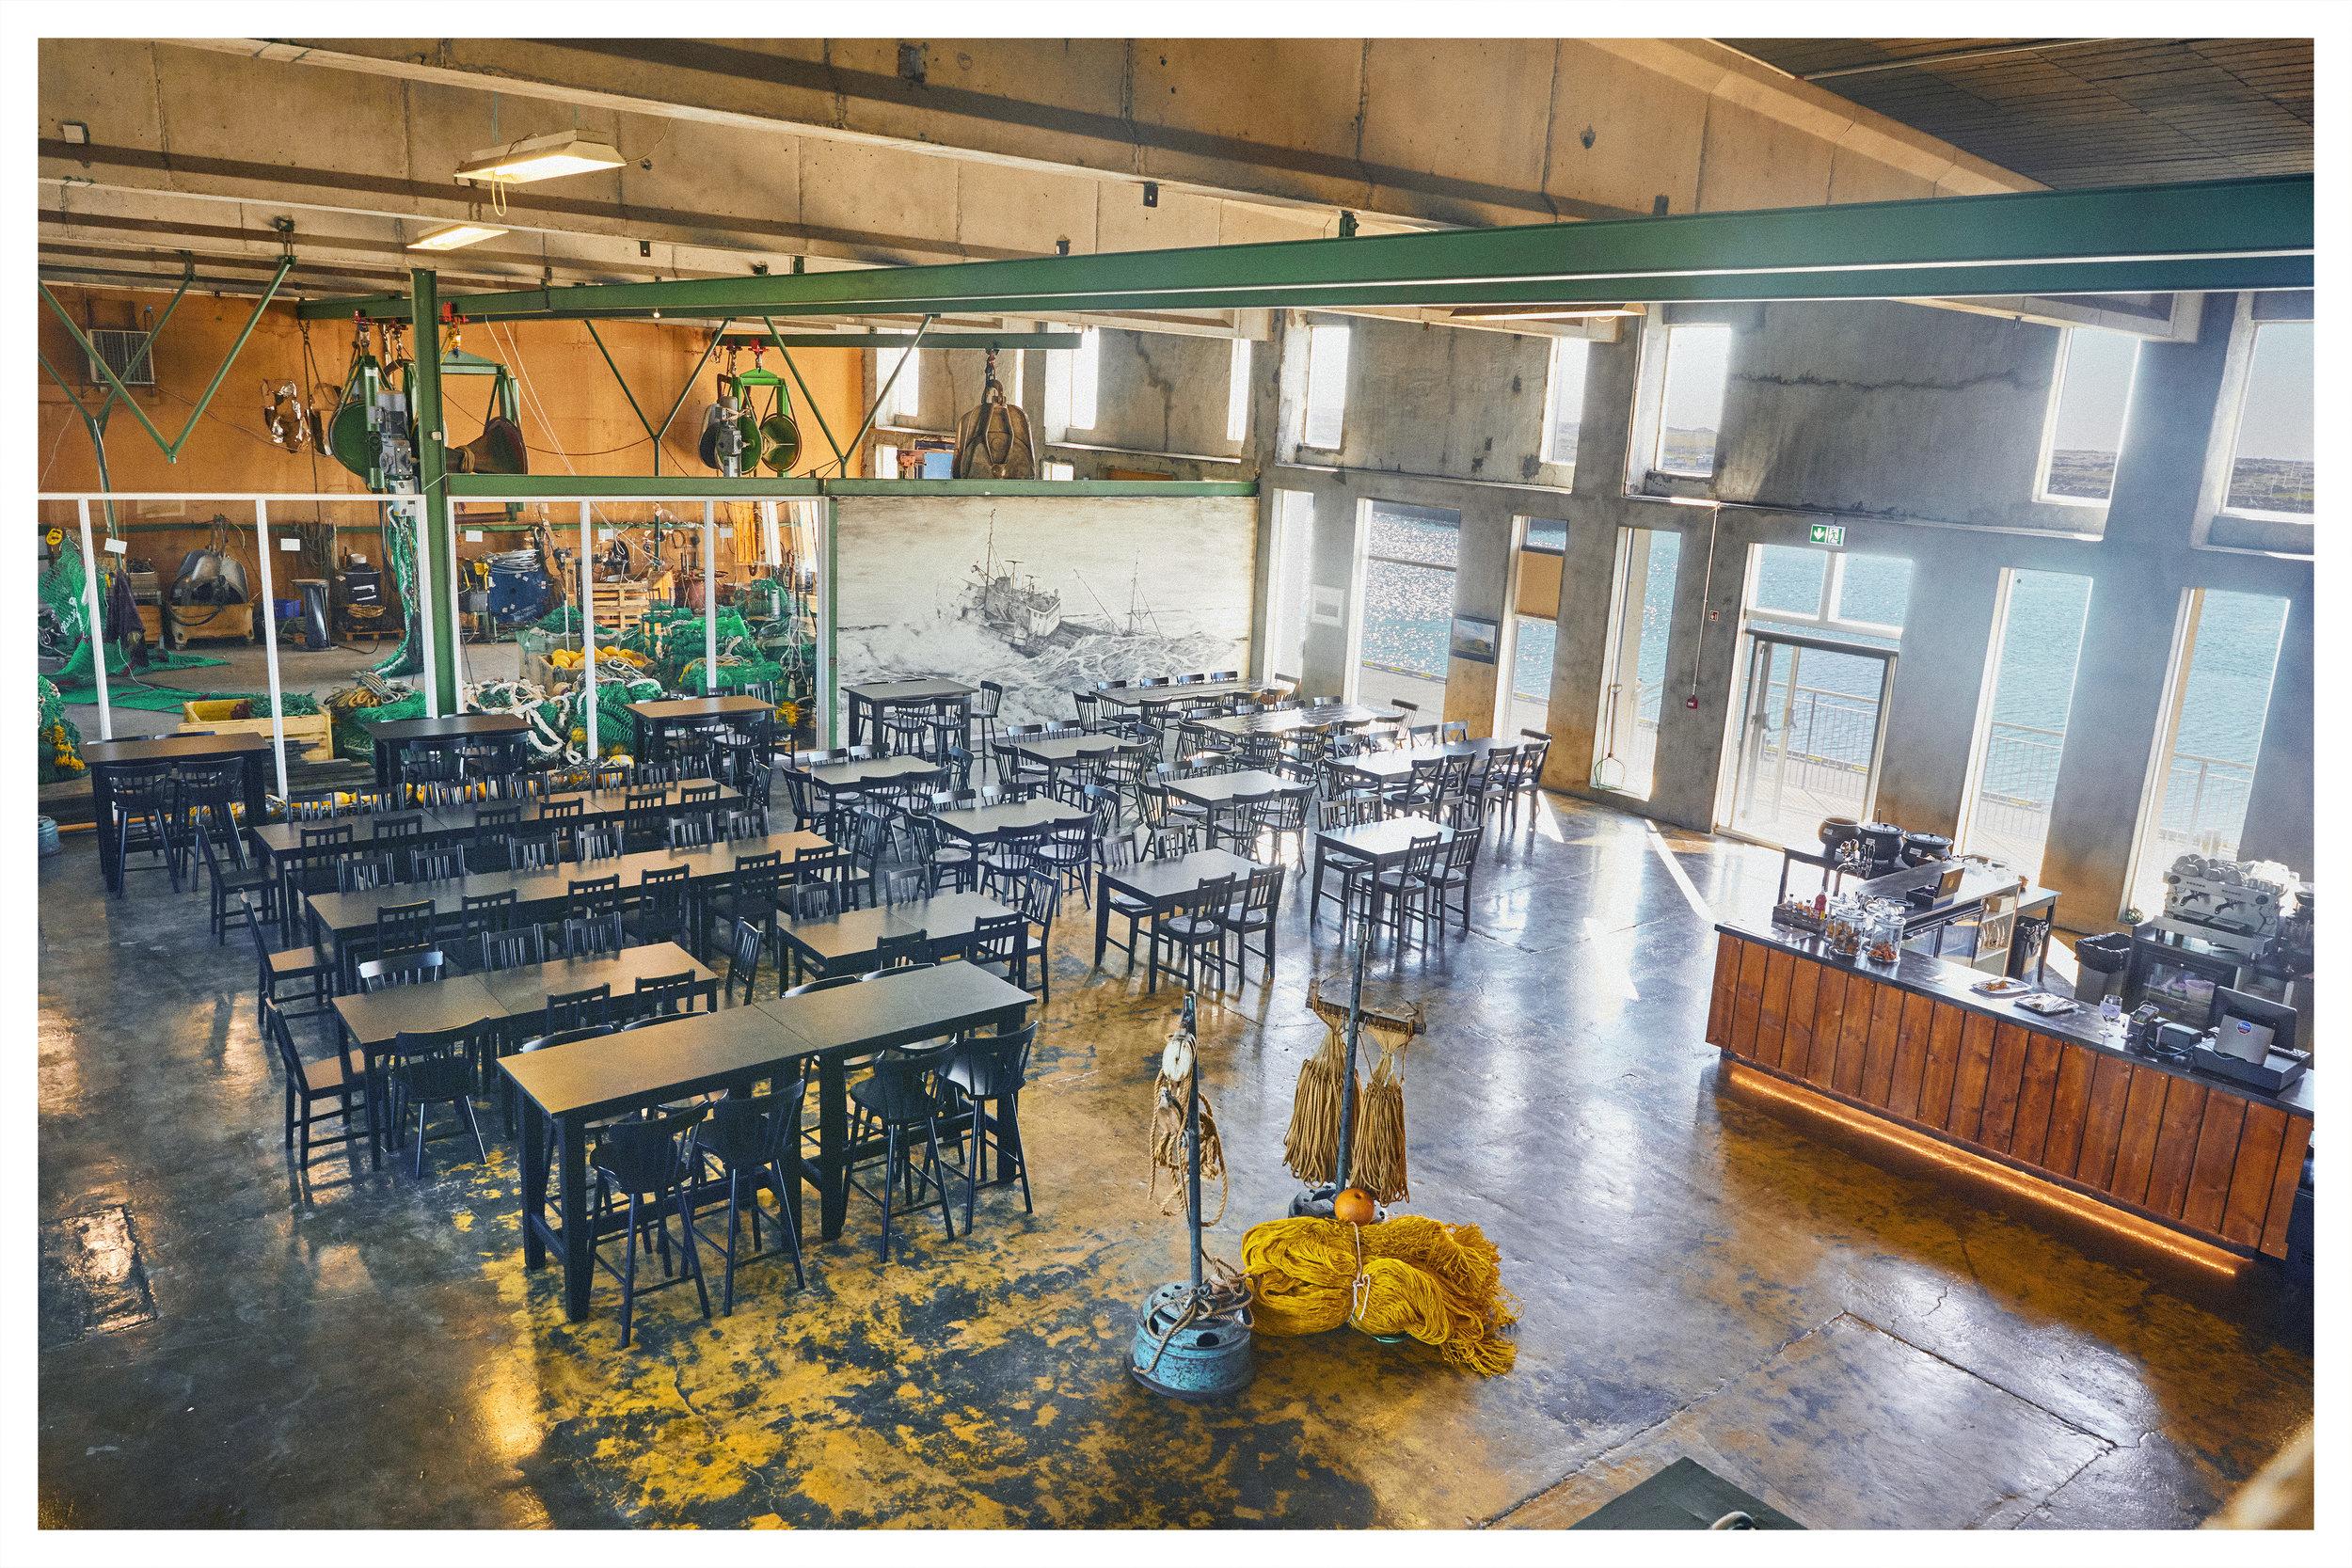 Netagerðin  - The new Netagerðin hall is a spacous hall that can accomodate 230 people.